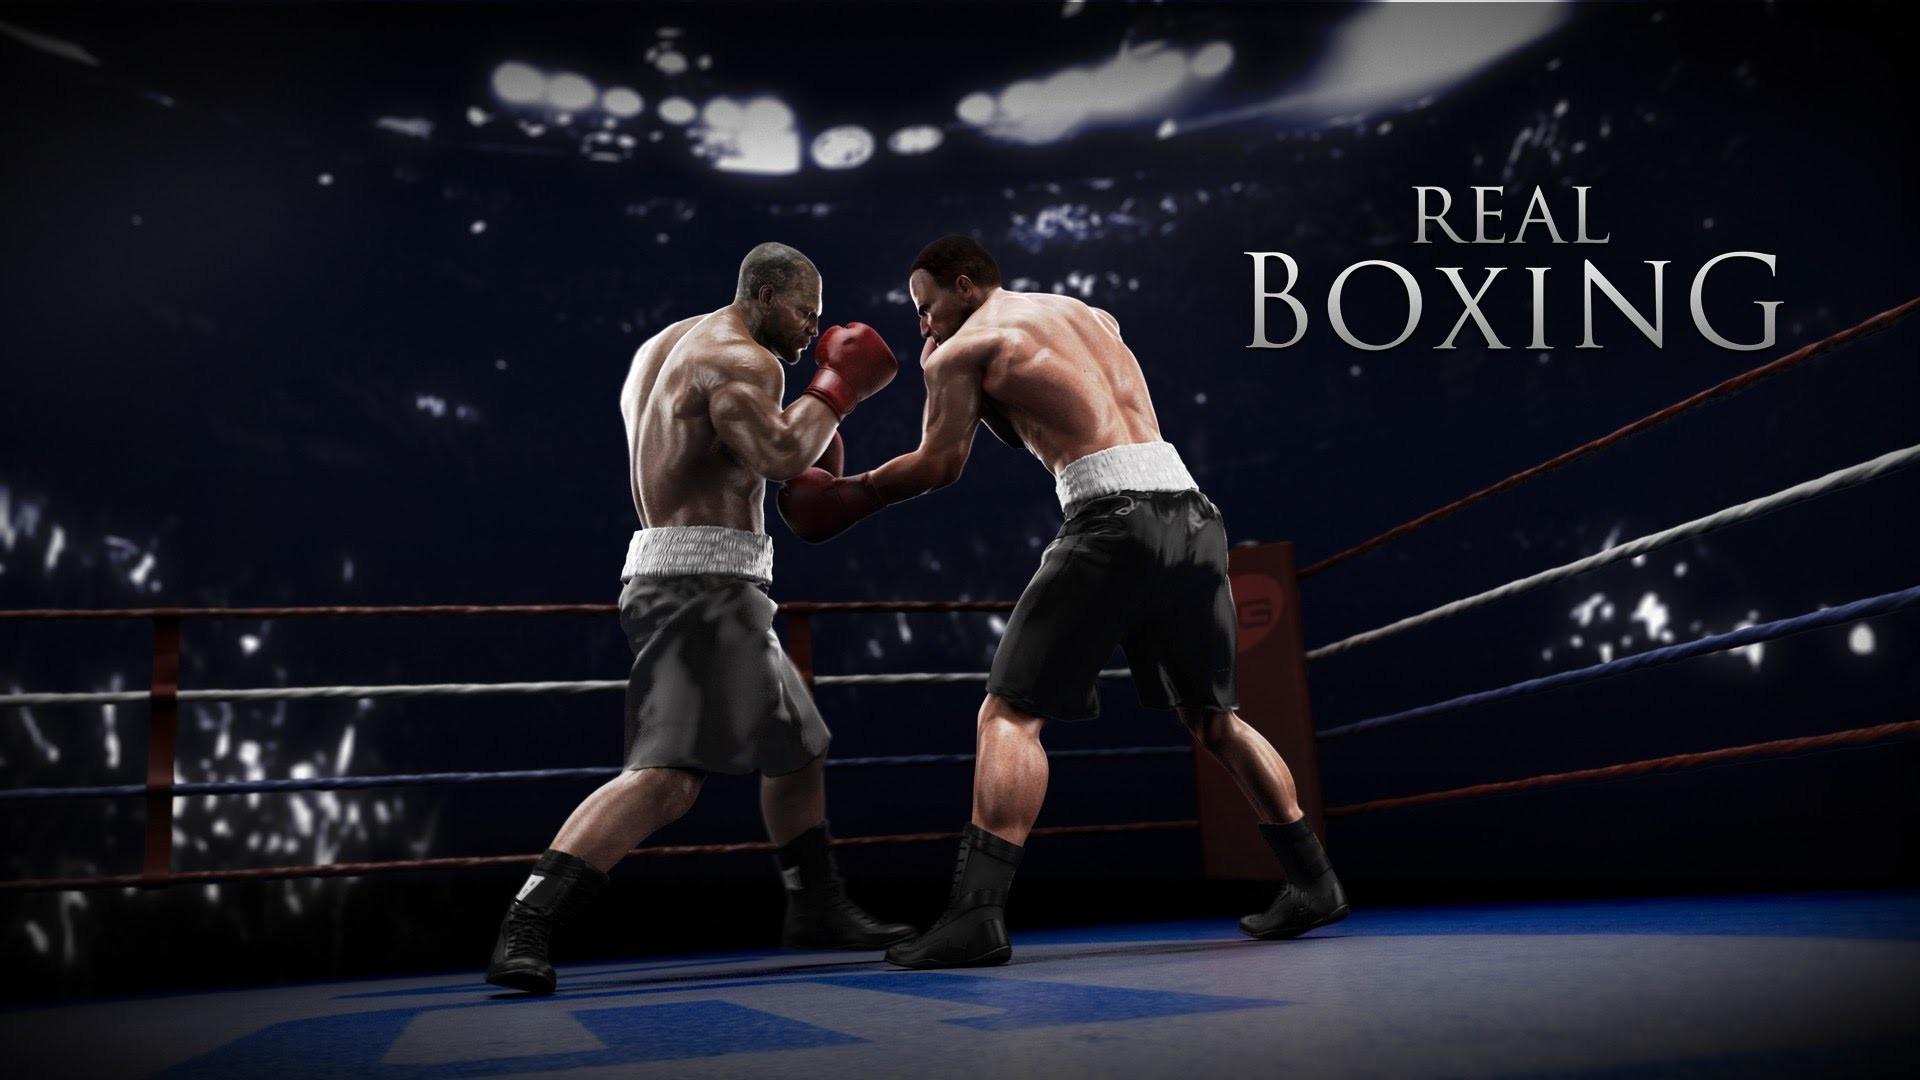 Sport Wallpaper Boxing